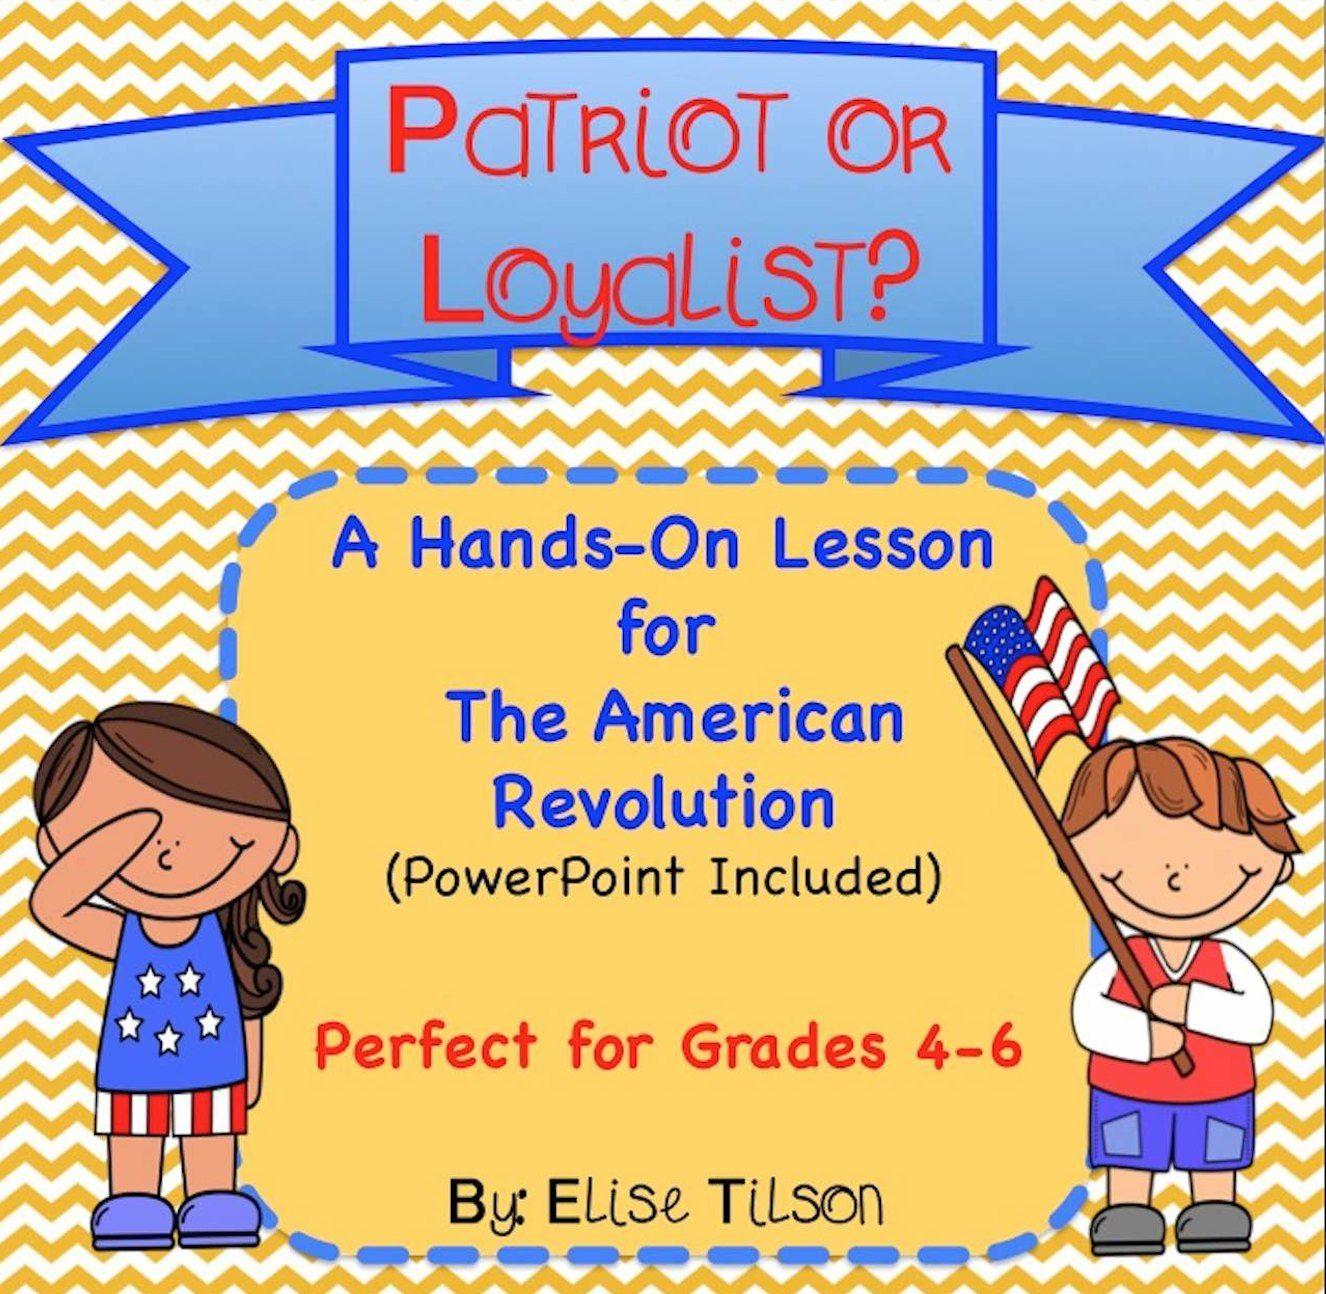 Patriots Vs Loyalists Common Core Lesson Plan For The